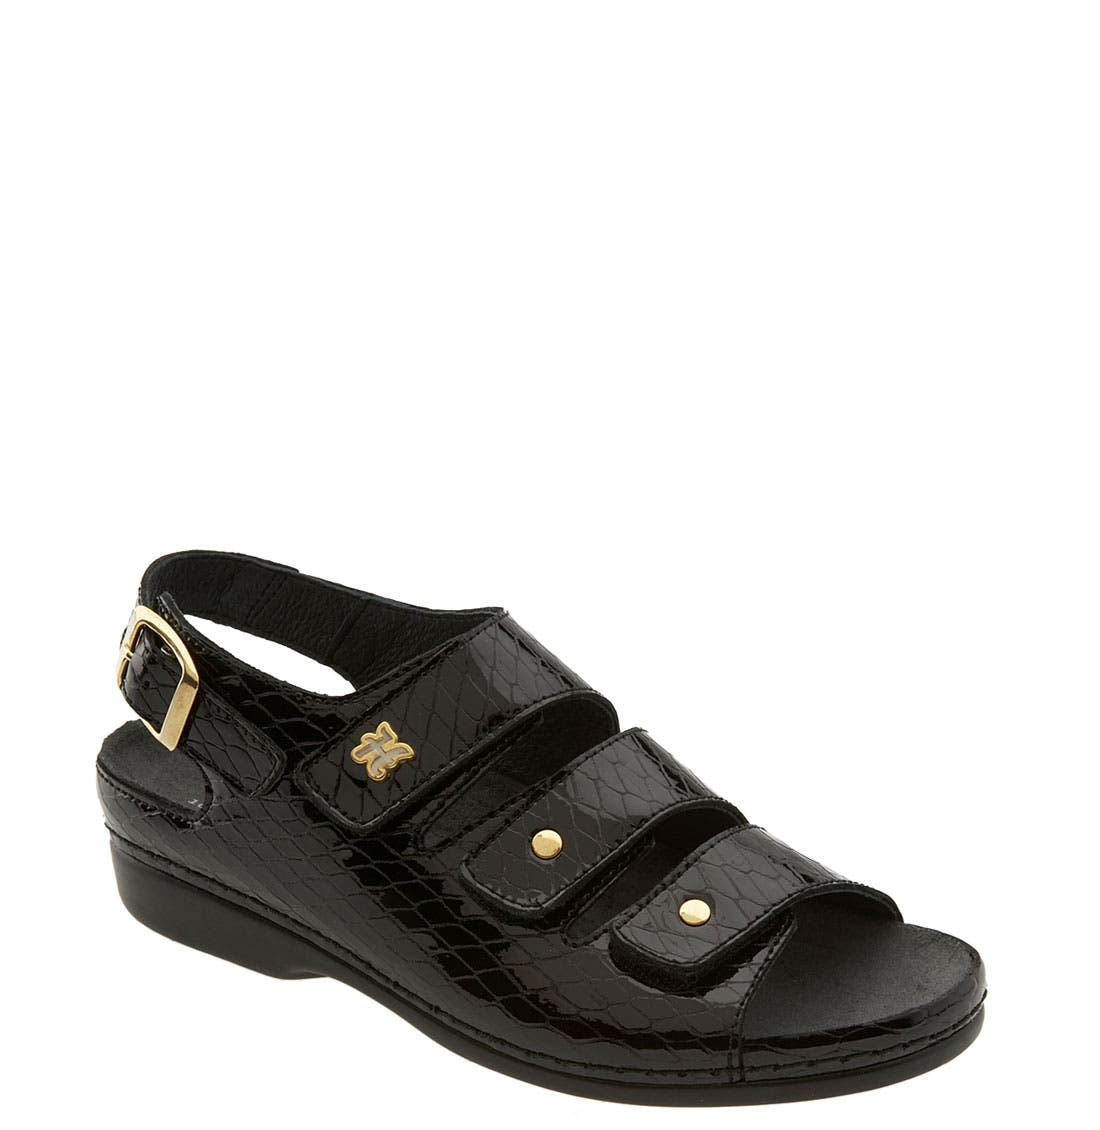 Alternate Image 1 Selected - Helle Comfort® '356-F' Sandal